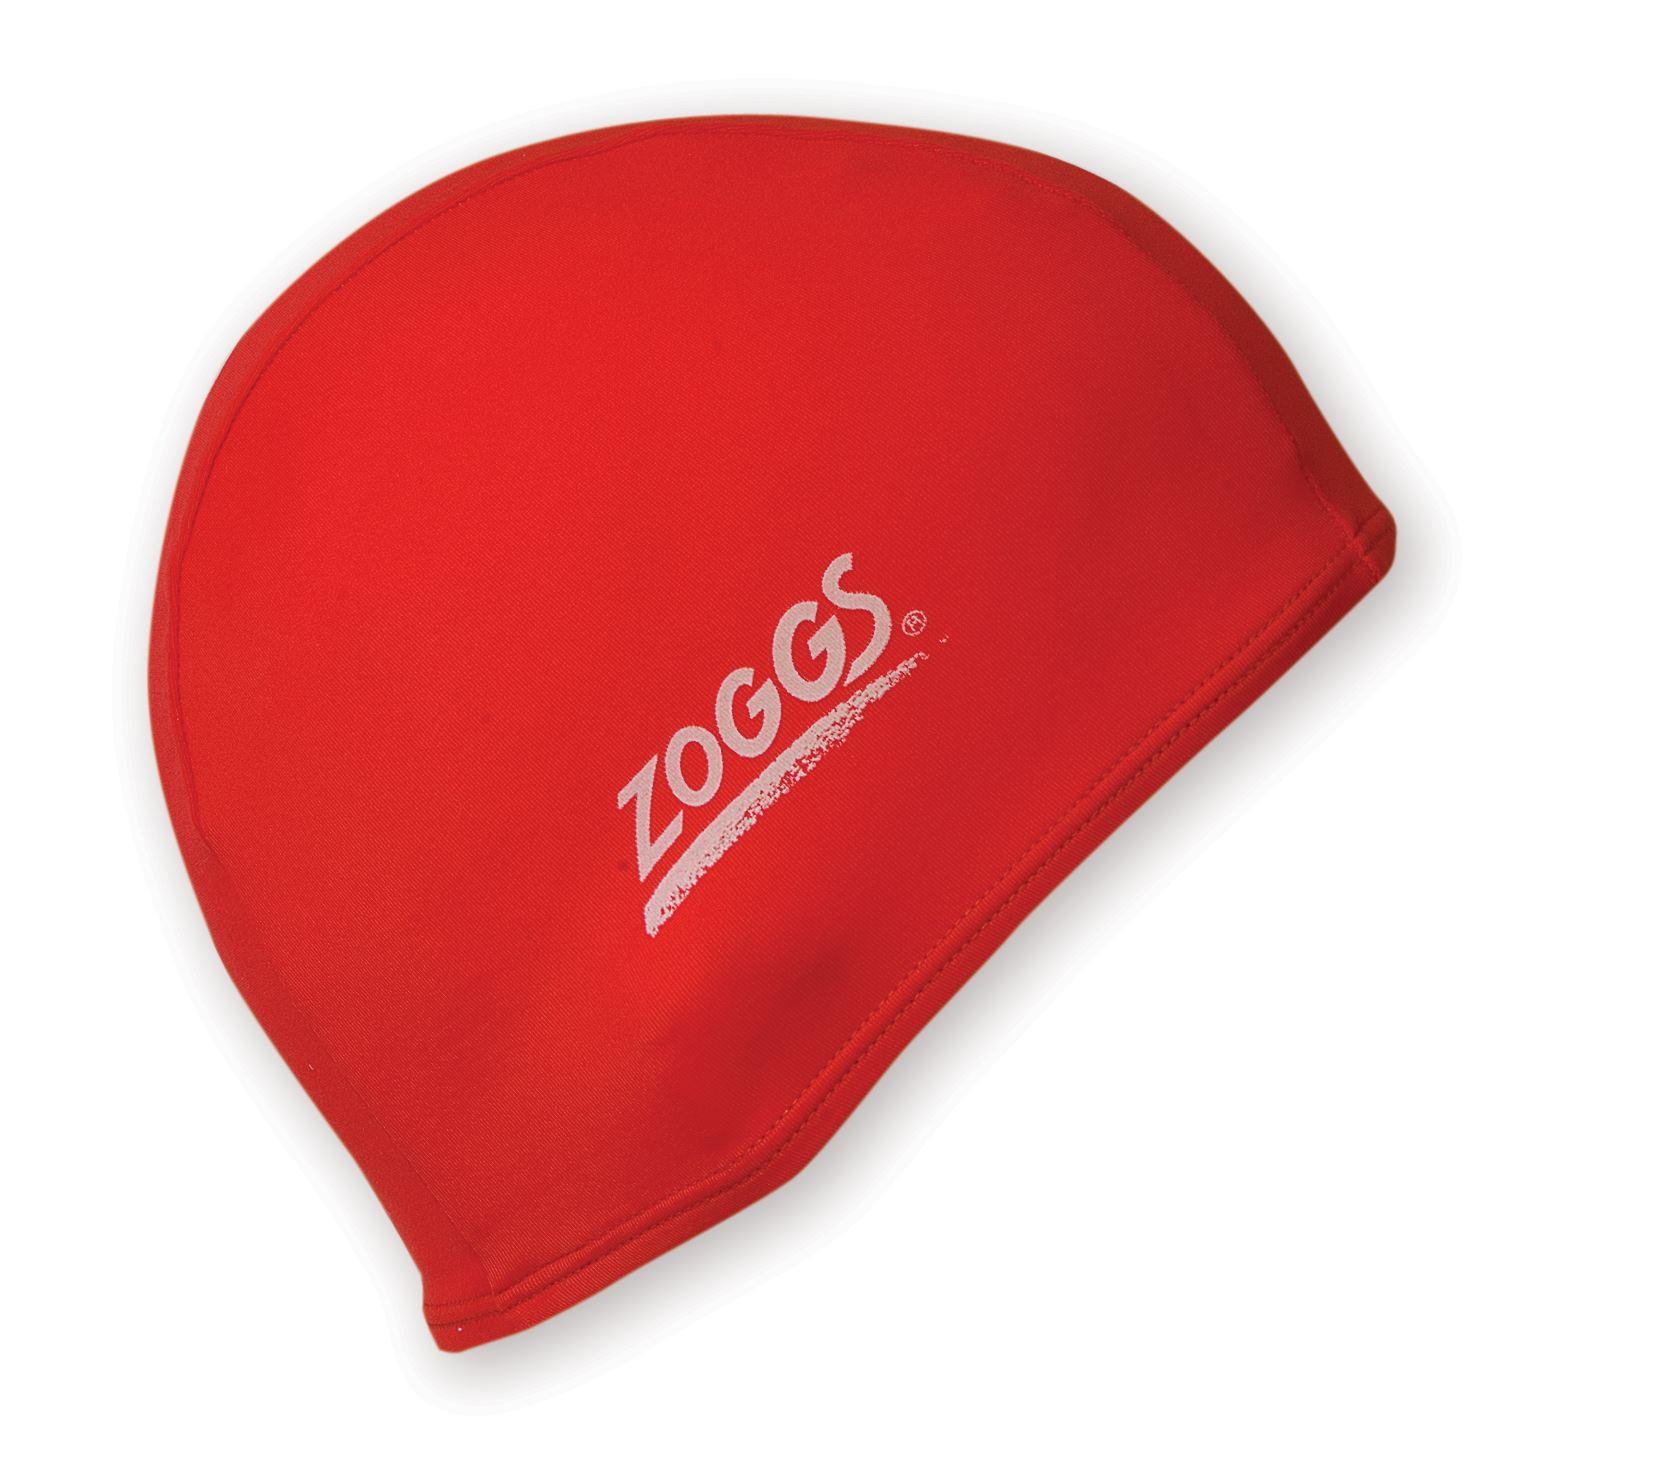 Zoggs Deluxe Stretch Cap Spandex Fabric Material Swimming Swim Pool Hat New Caps Ebay